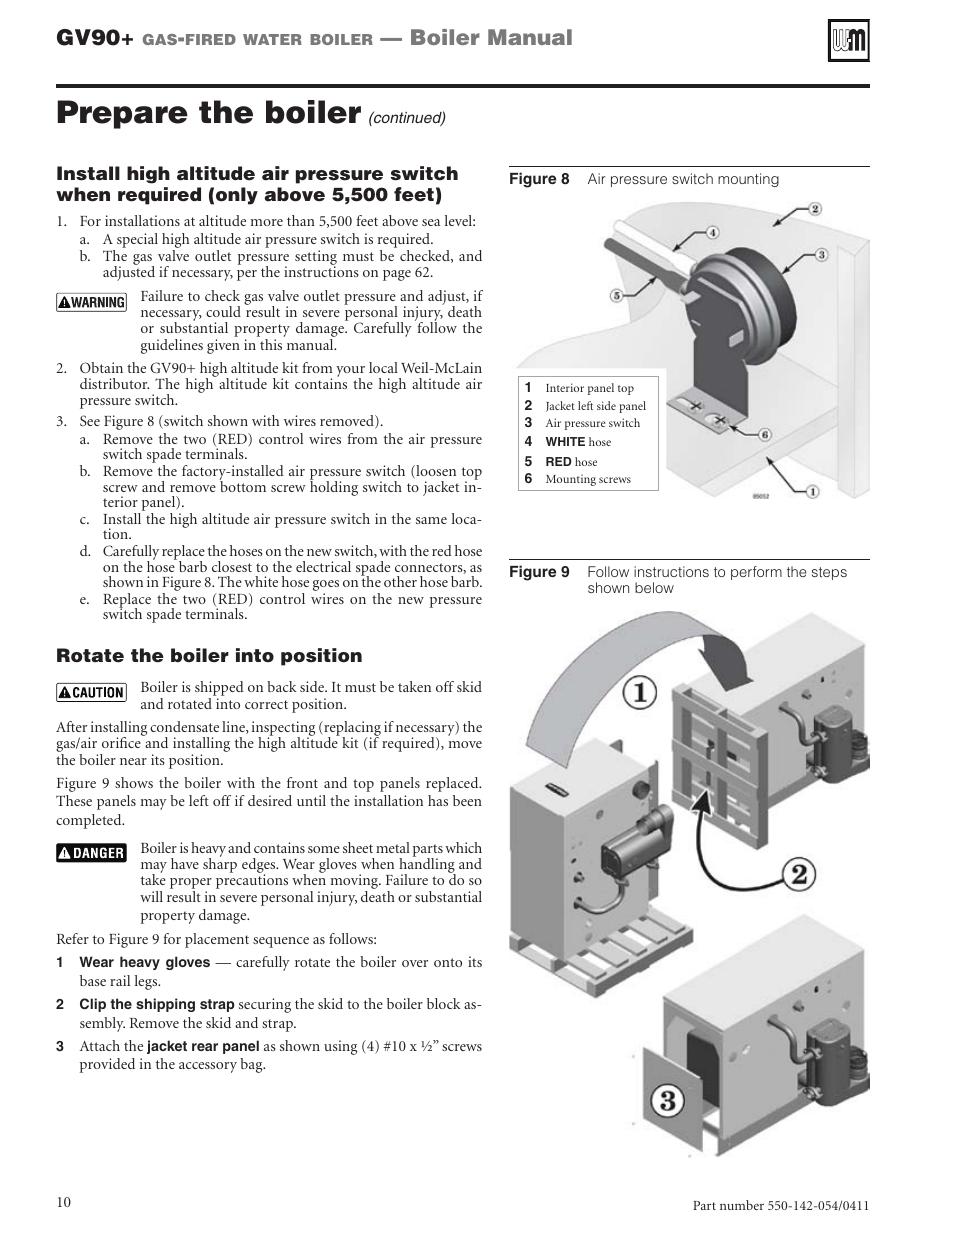 Prepare the boiler, Gv90, Boiler manual | Weil-McLain GV90+ User ...